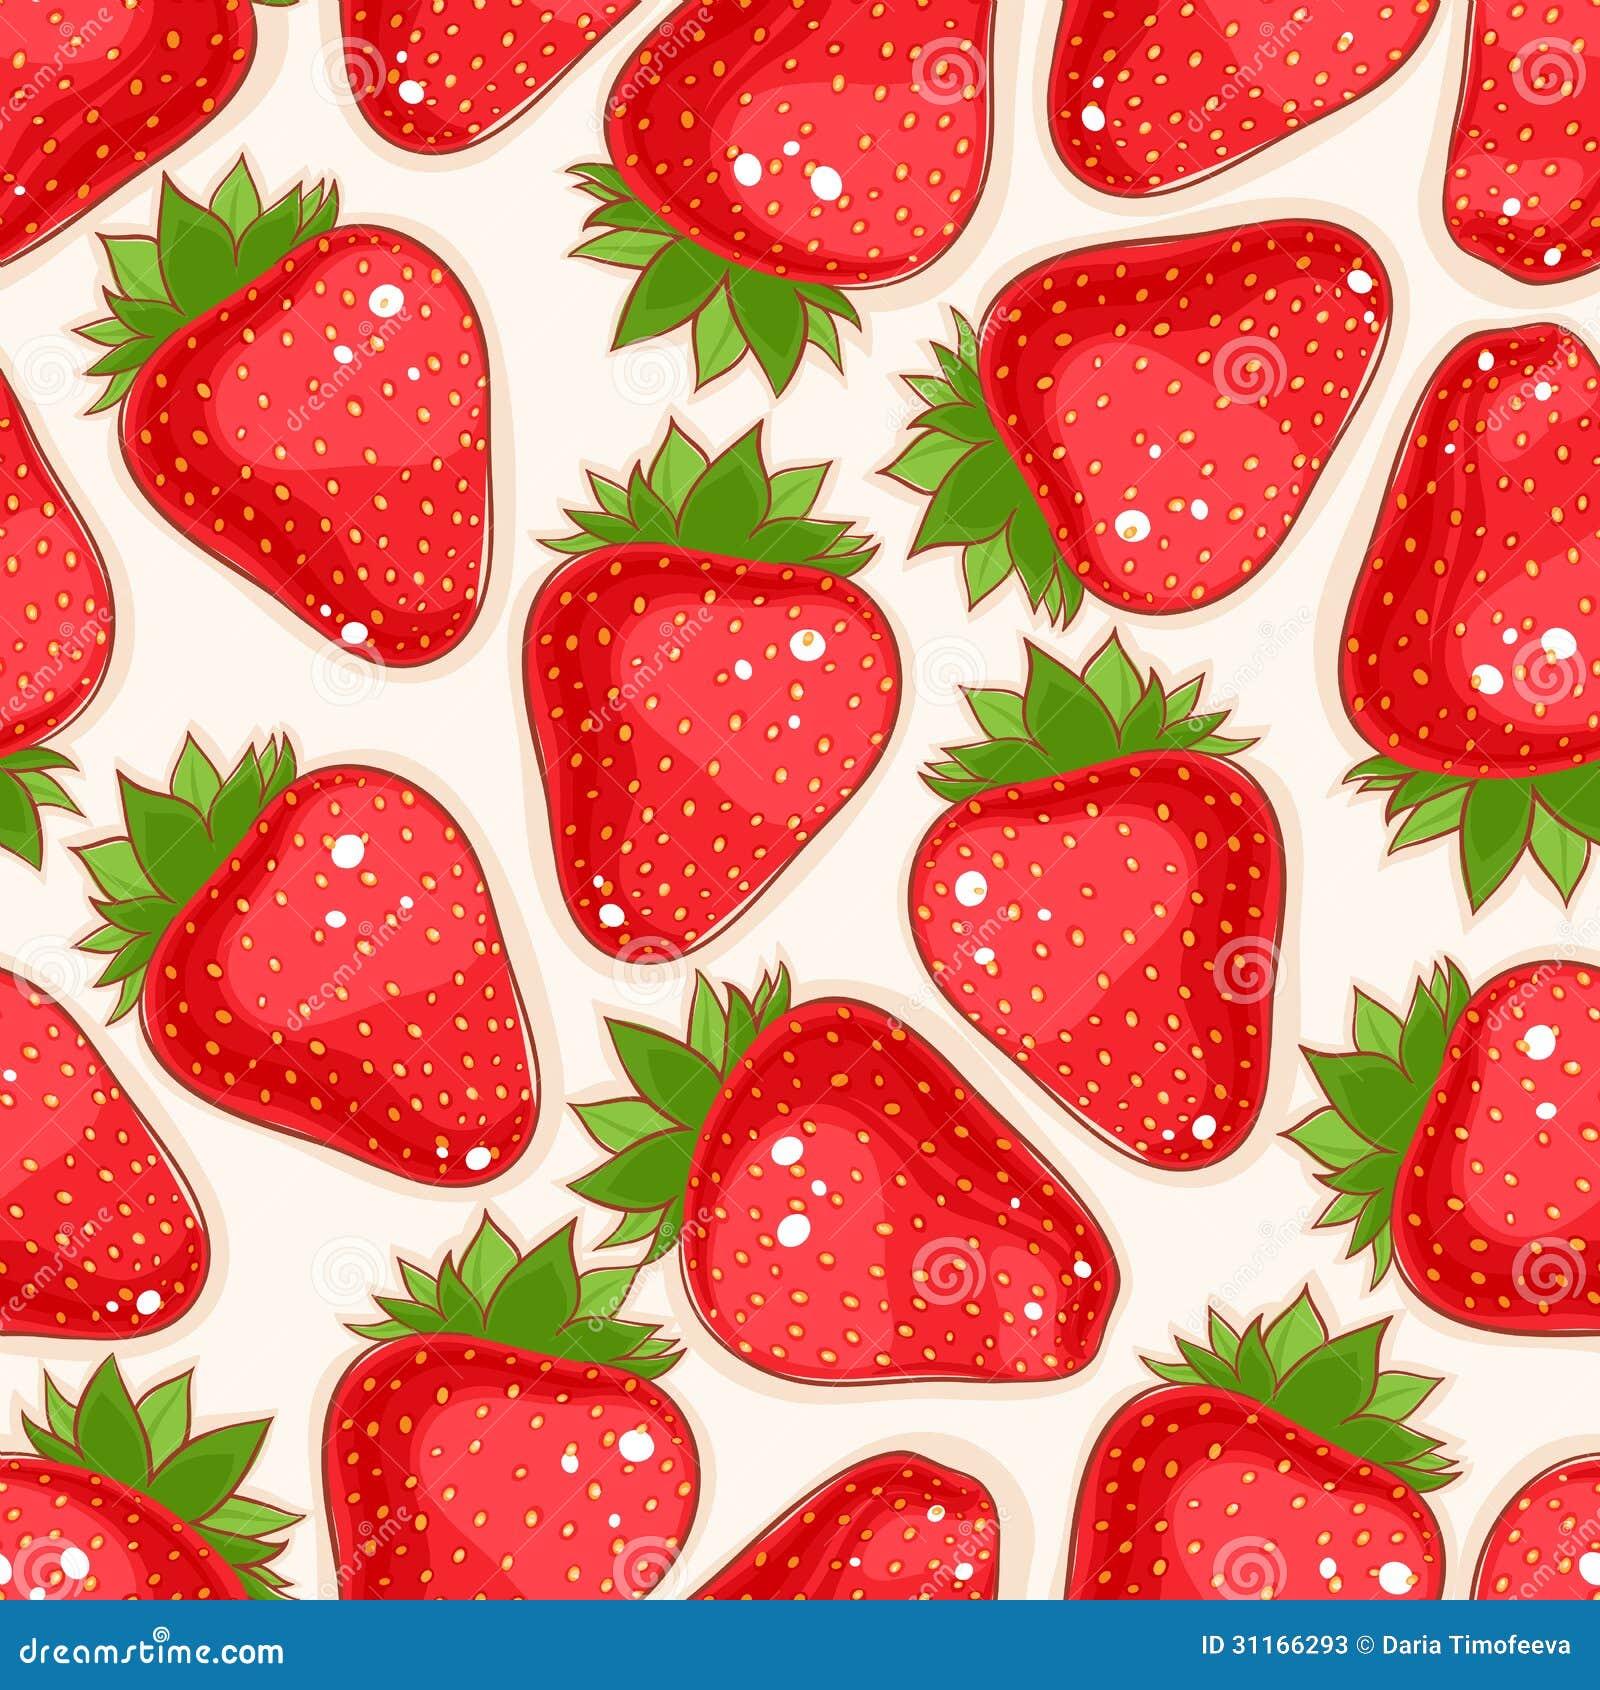 kawaii strawberry wallpaper vintage - photo #48